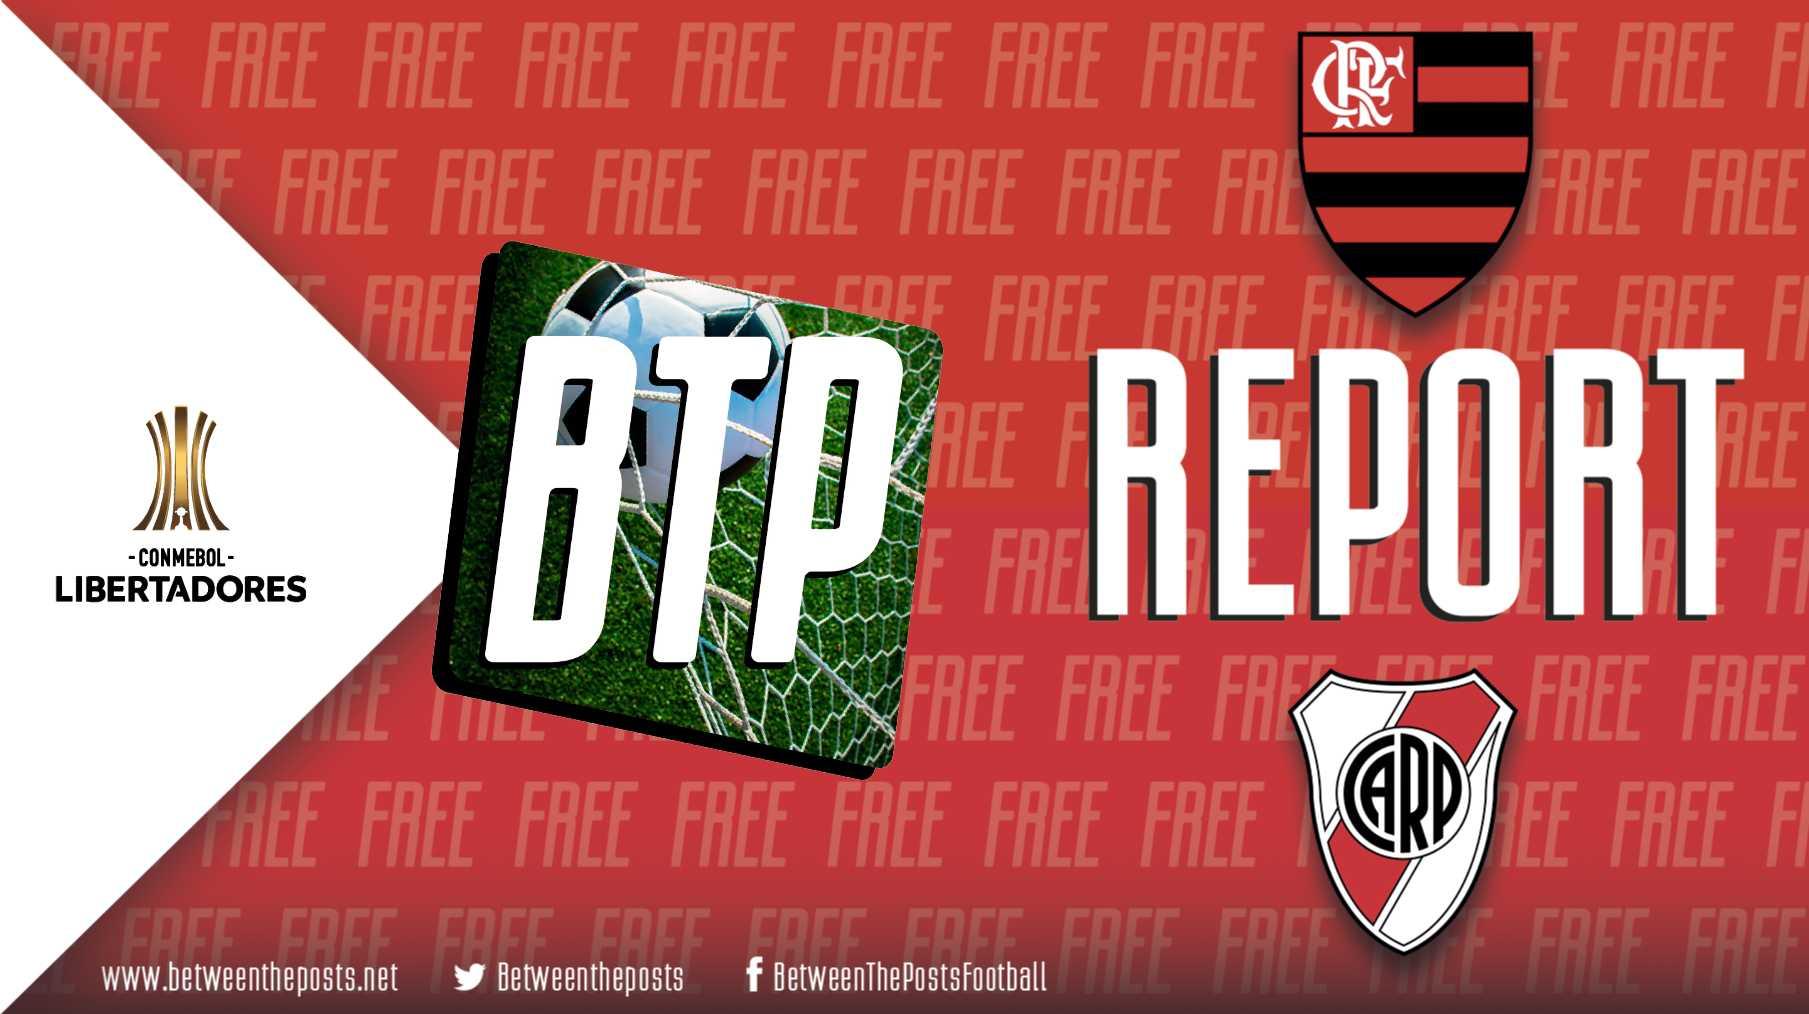 Flamengo River Plate